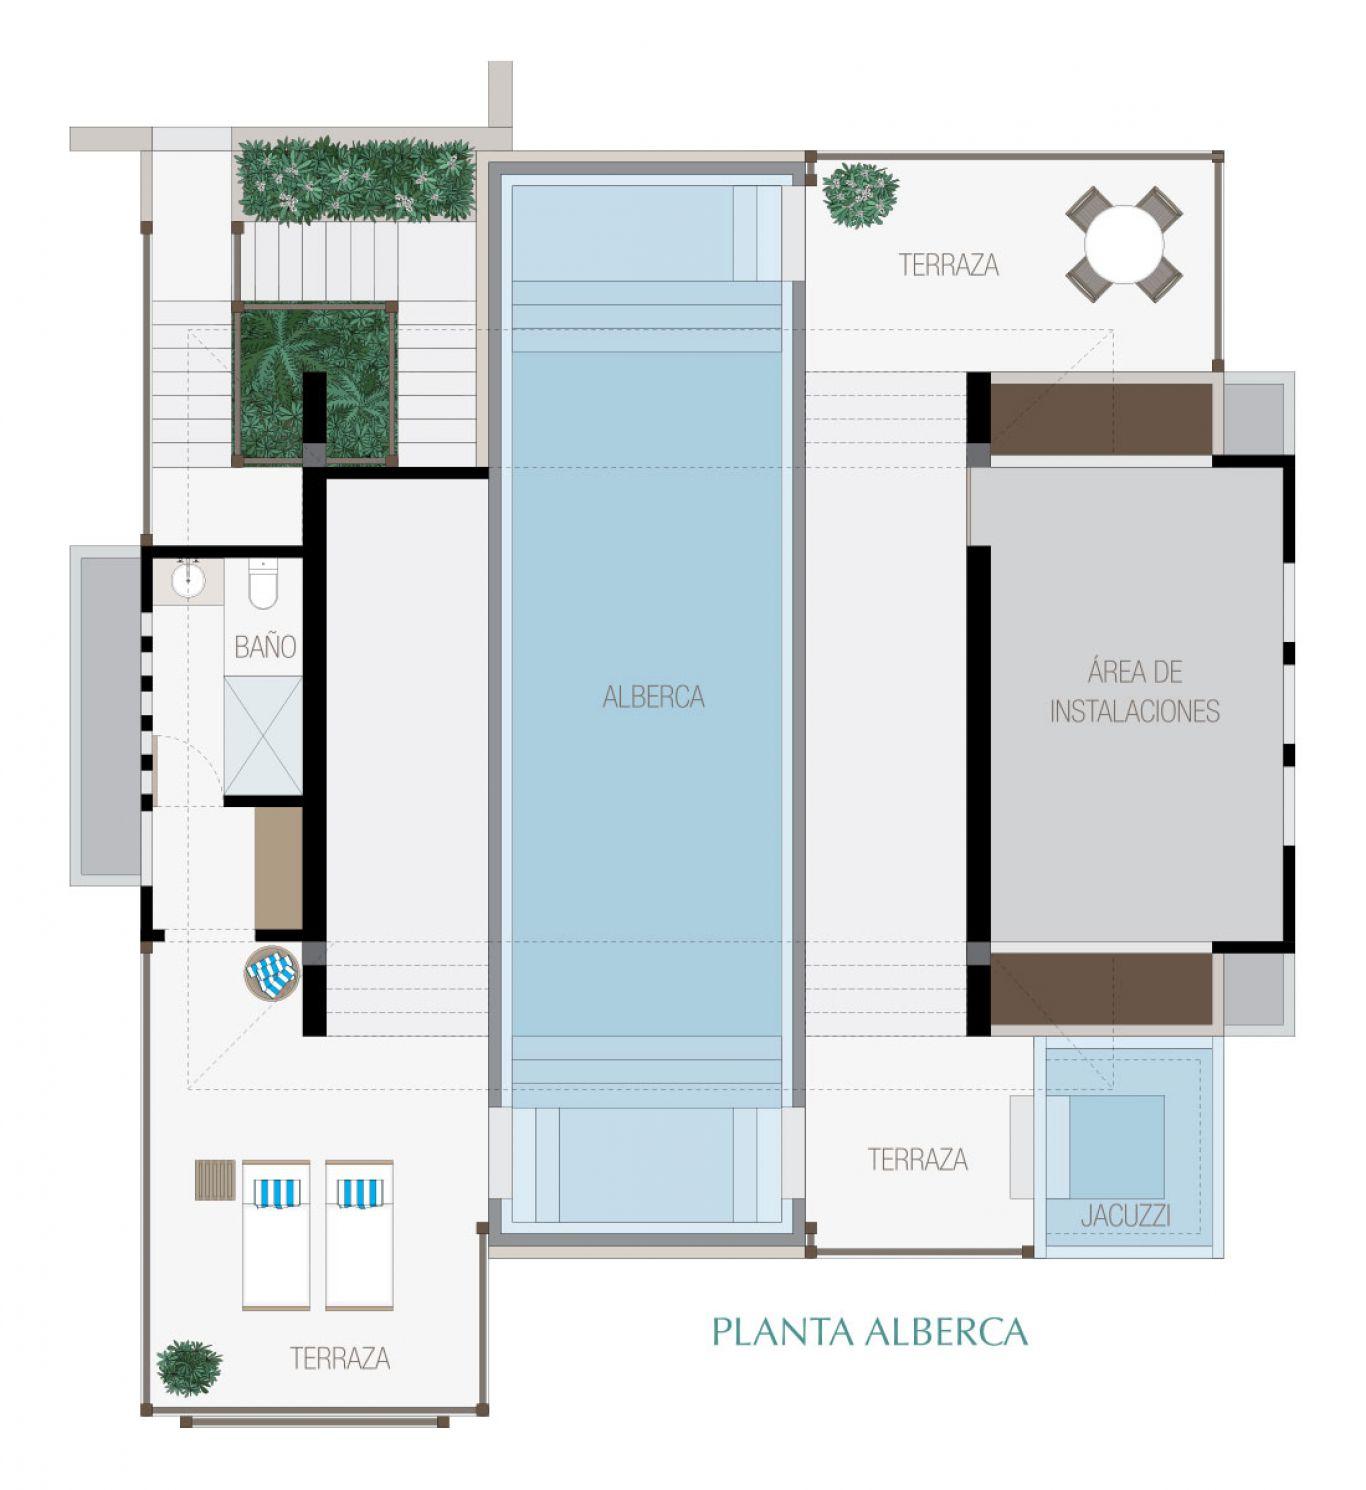 Manai, id 1519068, no 4, plano de villa 10, 300